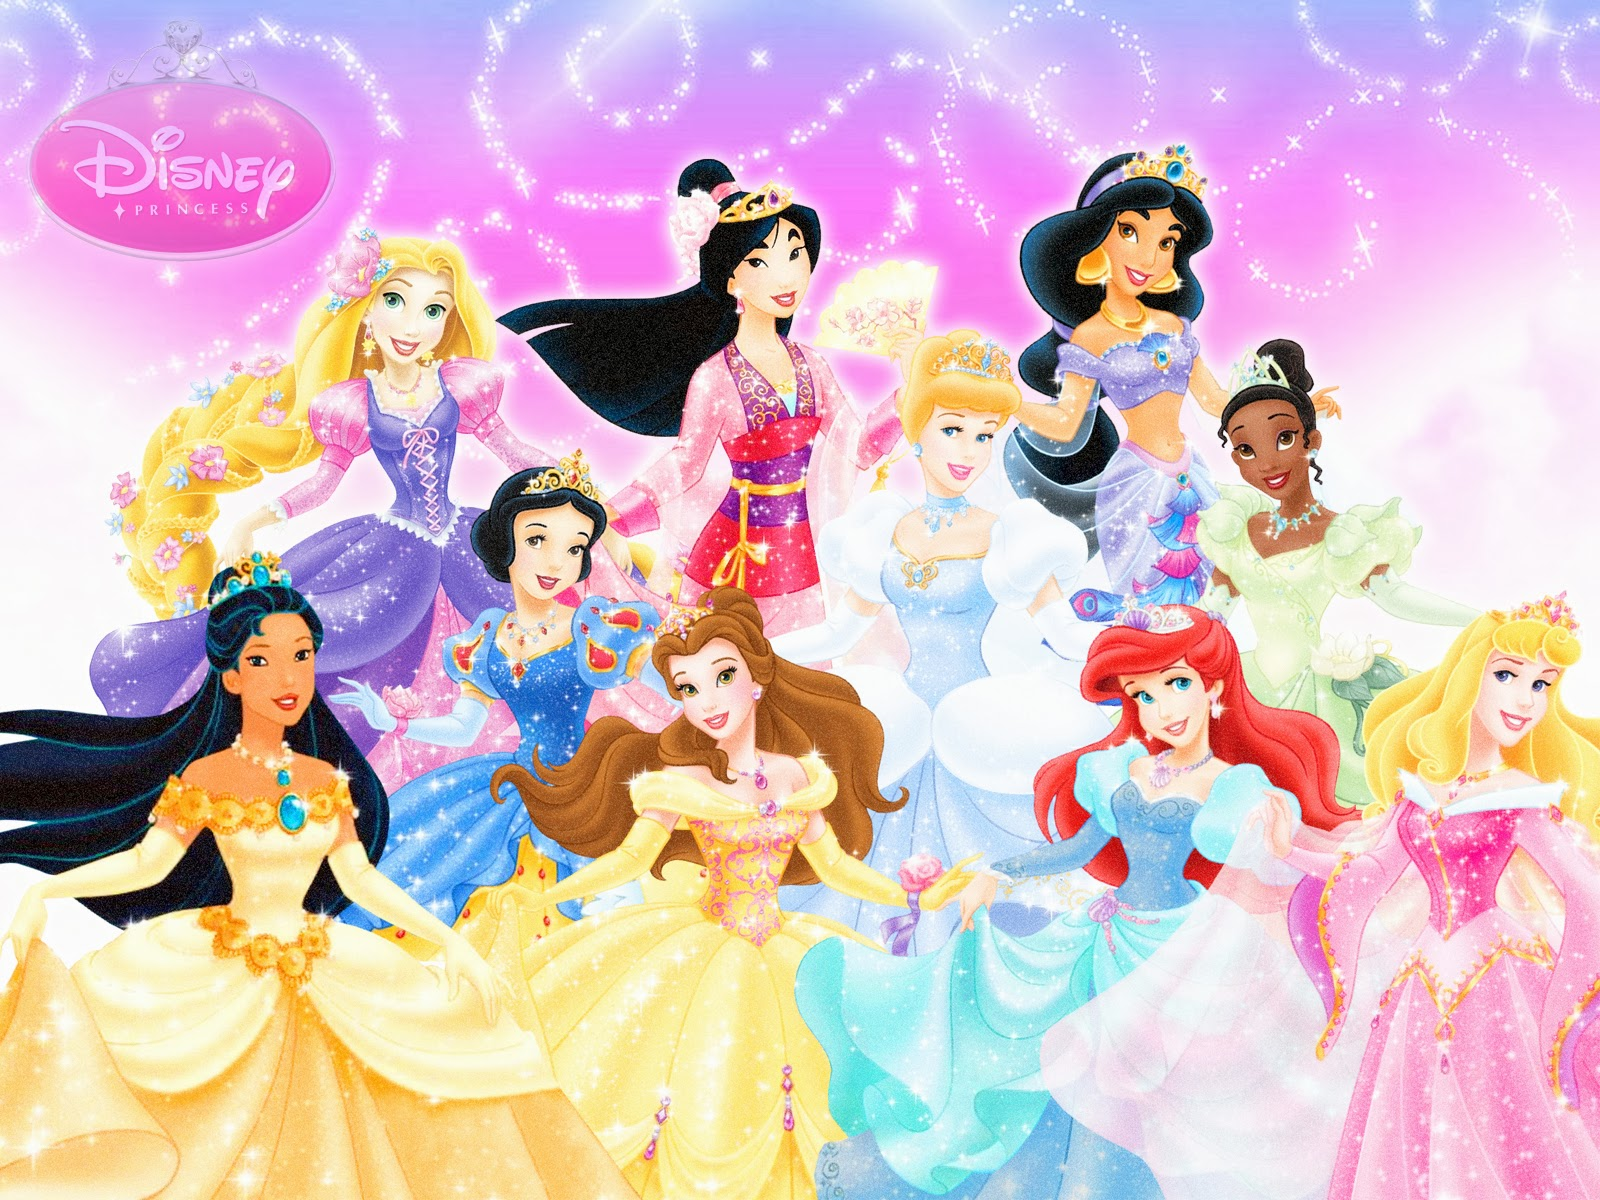 Disney Princess HD Wallpapers Download   Best Photos Wallpapers 1600x1200